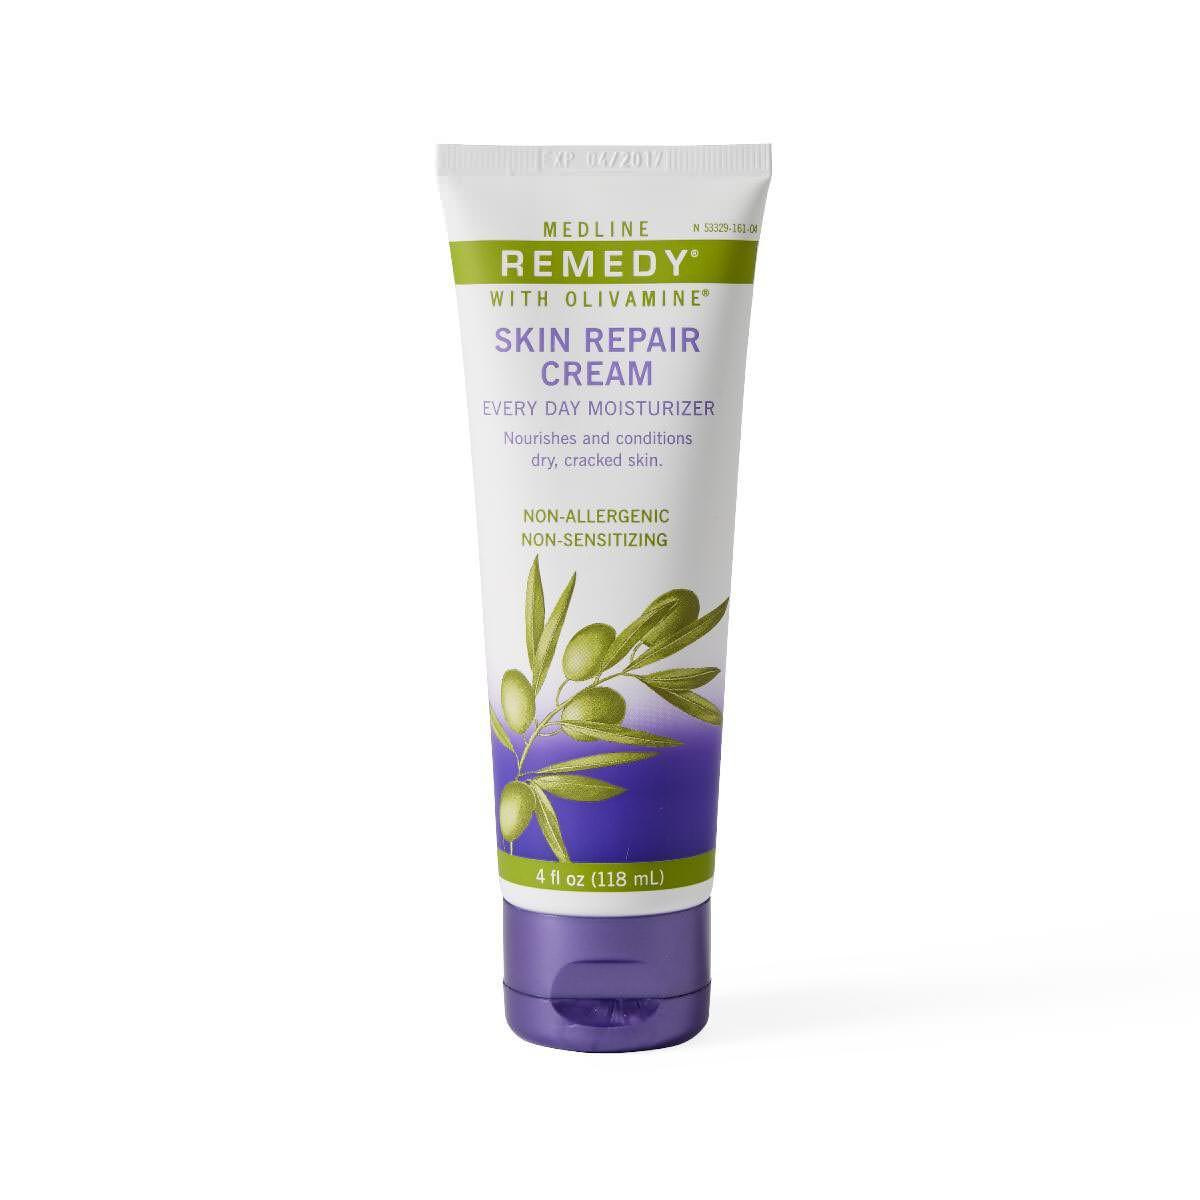 Medline Remedy Olivamine Skin Repair Cream, 2 oz. Tube